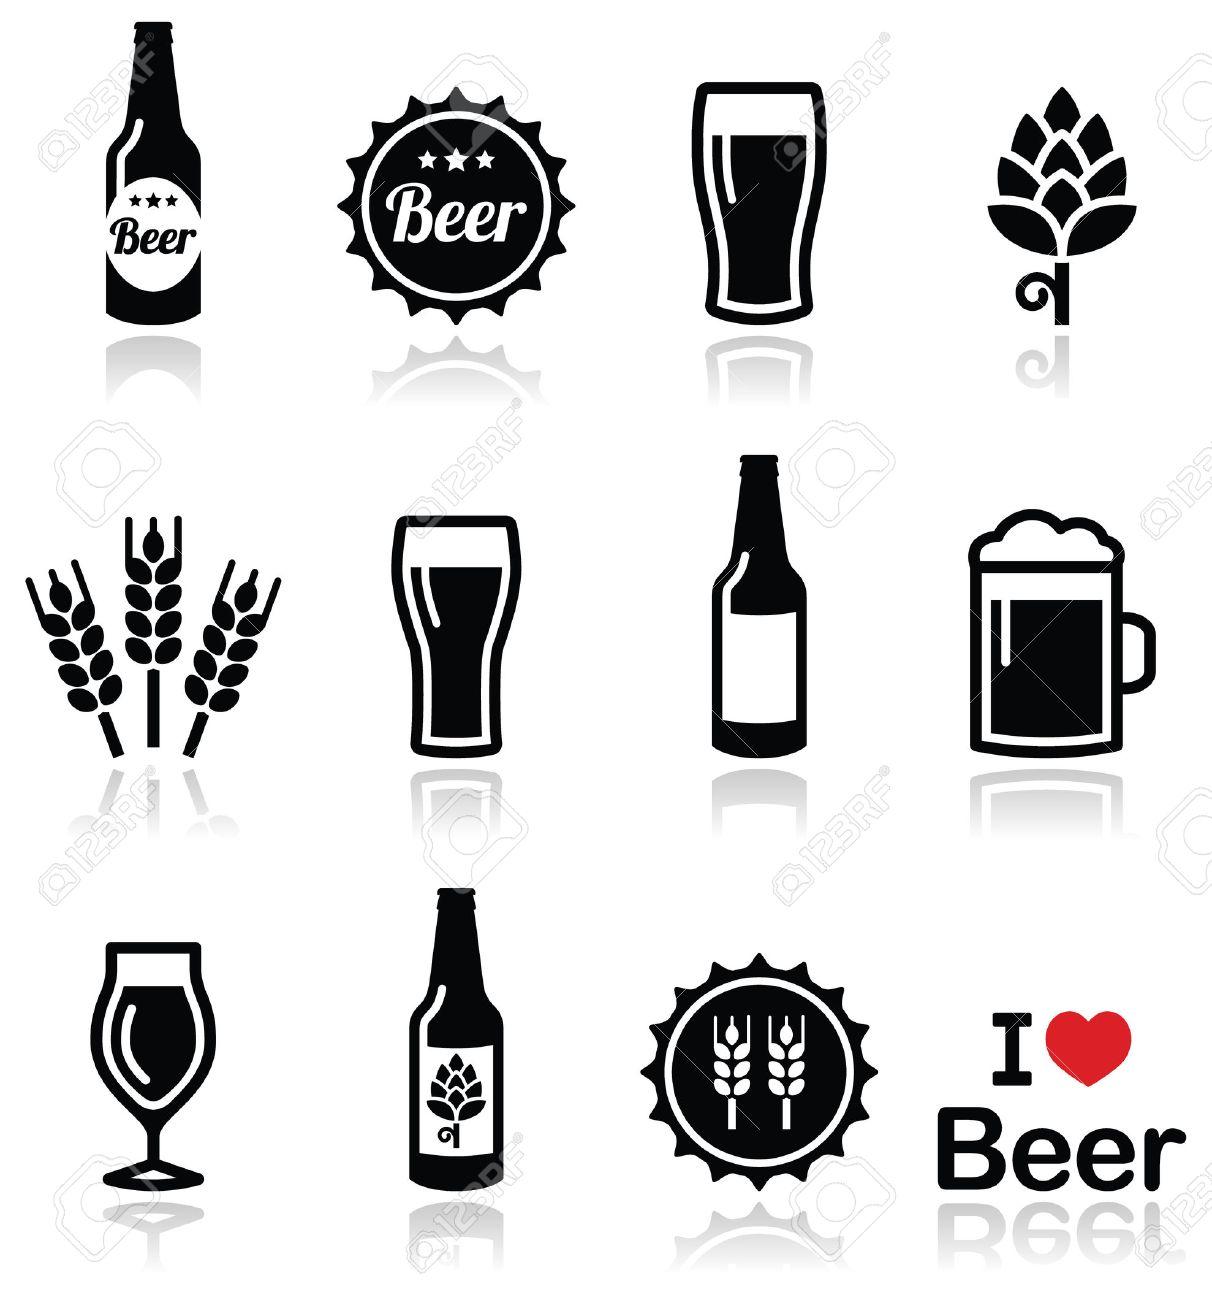 beer vector icons set bottle glass pint royalty free cliparts rh 123rf com beer vector mechanics dynamics beer vector mechanics solutions manual